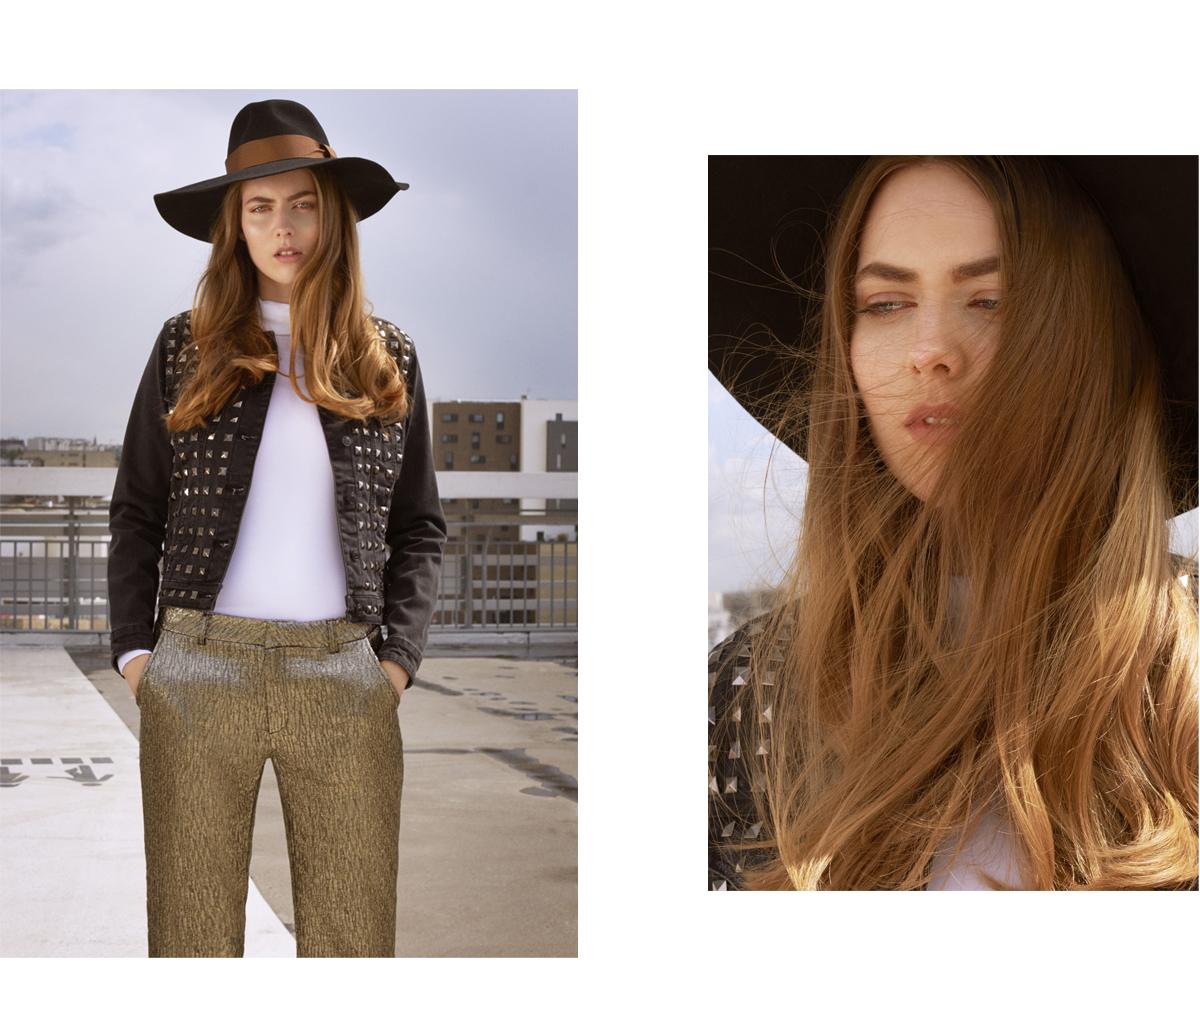 model fashionstory urban girl folk stylemkt studio styling laurent desgrange photography sylvain la rosa